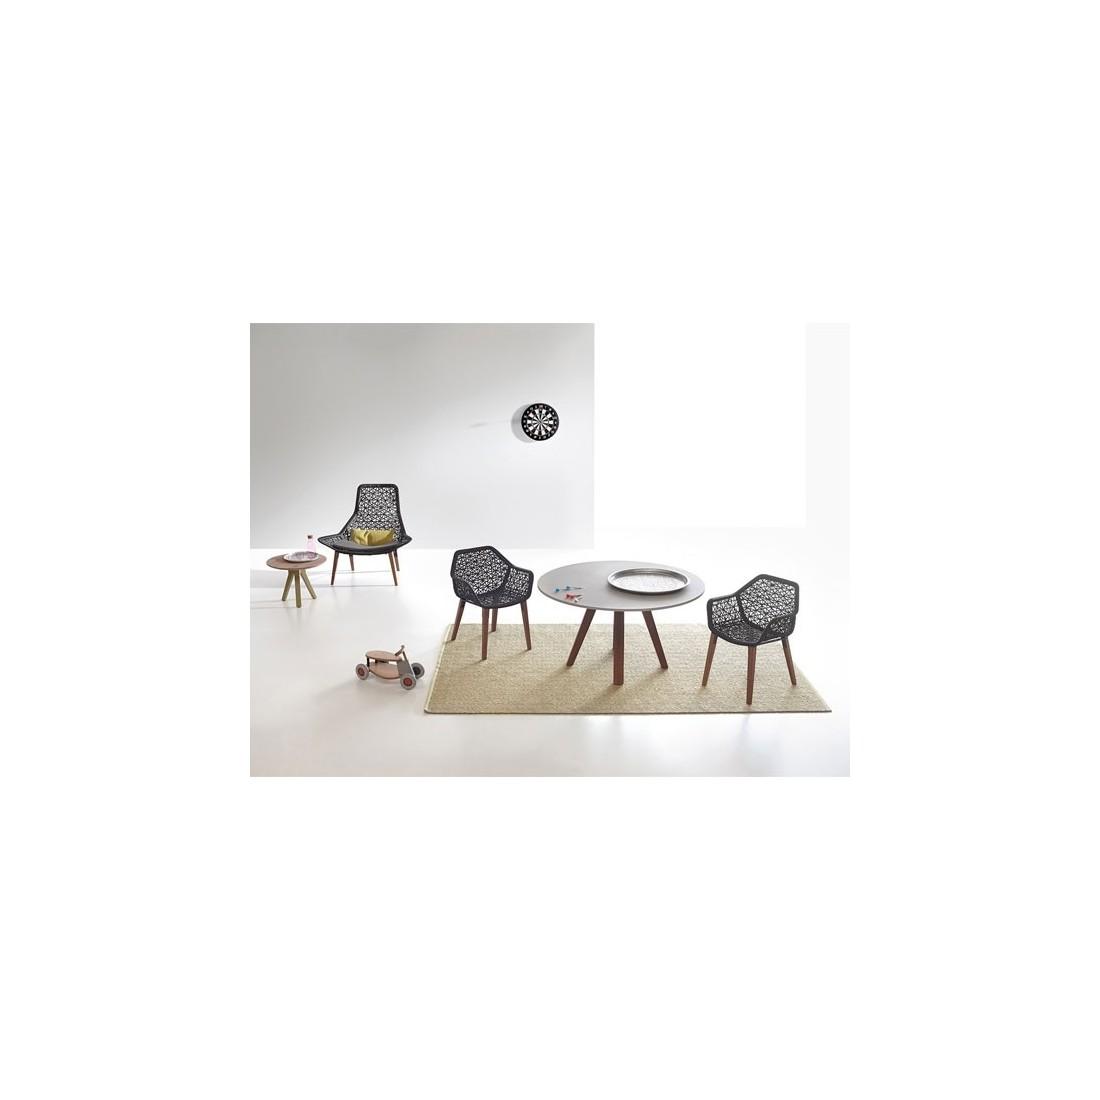 fauteuil salle manger maia pieds en teck kettal kettal confort jardin. Black Bedroom Furniture Sets. Home Design Ideas